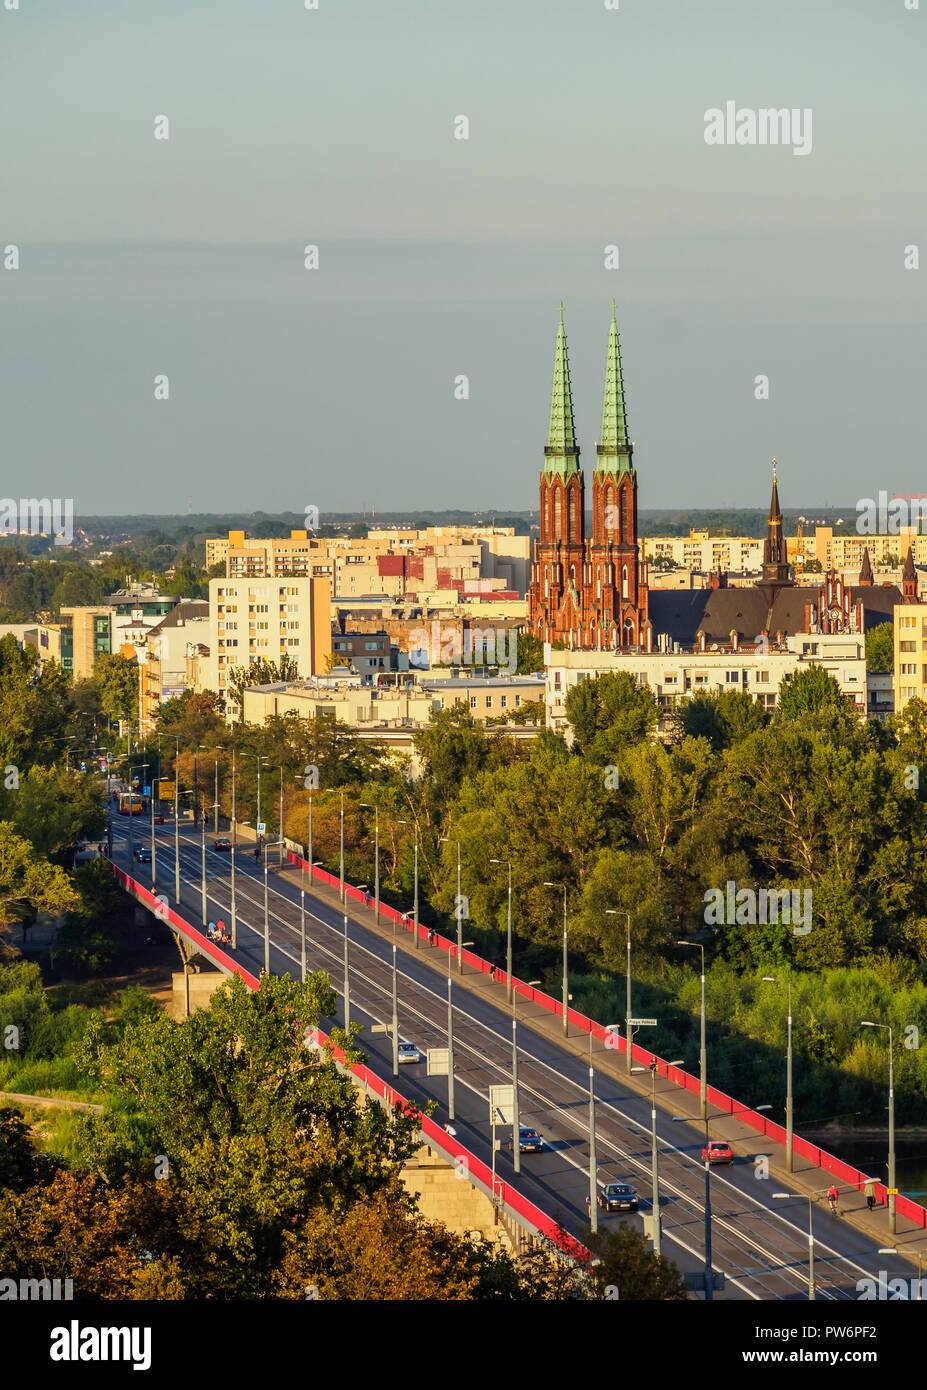 View towards the Praga District and St. Florian's Cathedral, Warsaw, Masovian Voivodeship, Poland - Stock Image